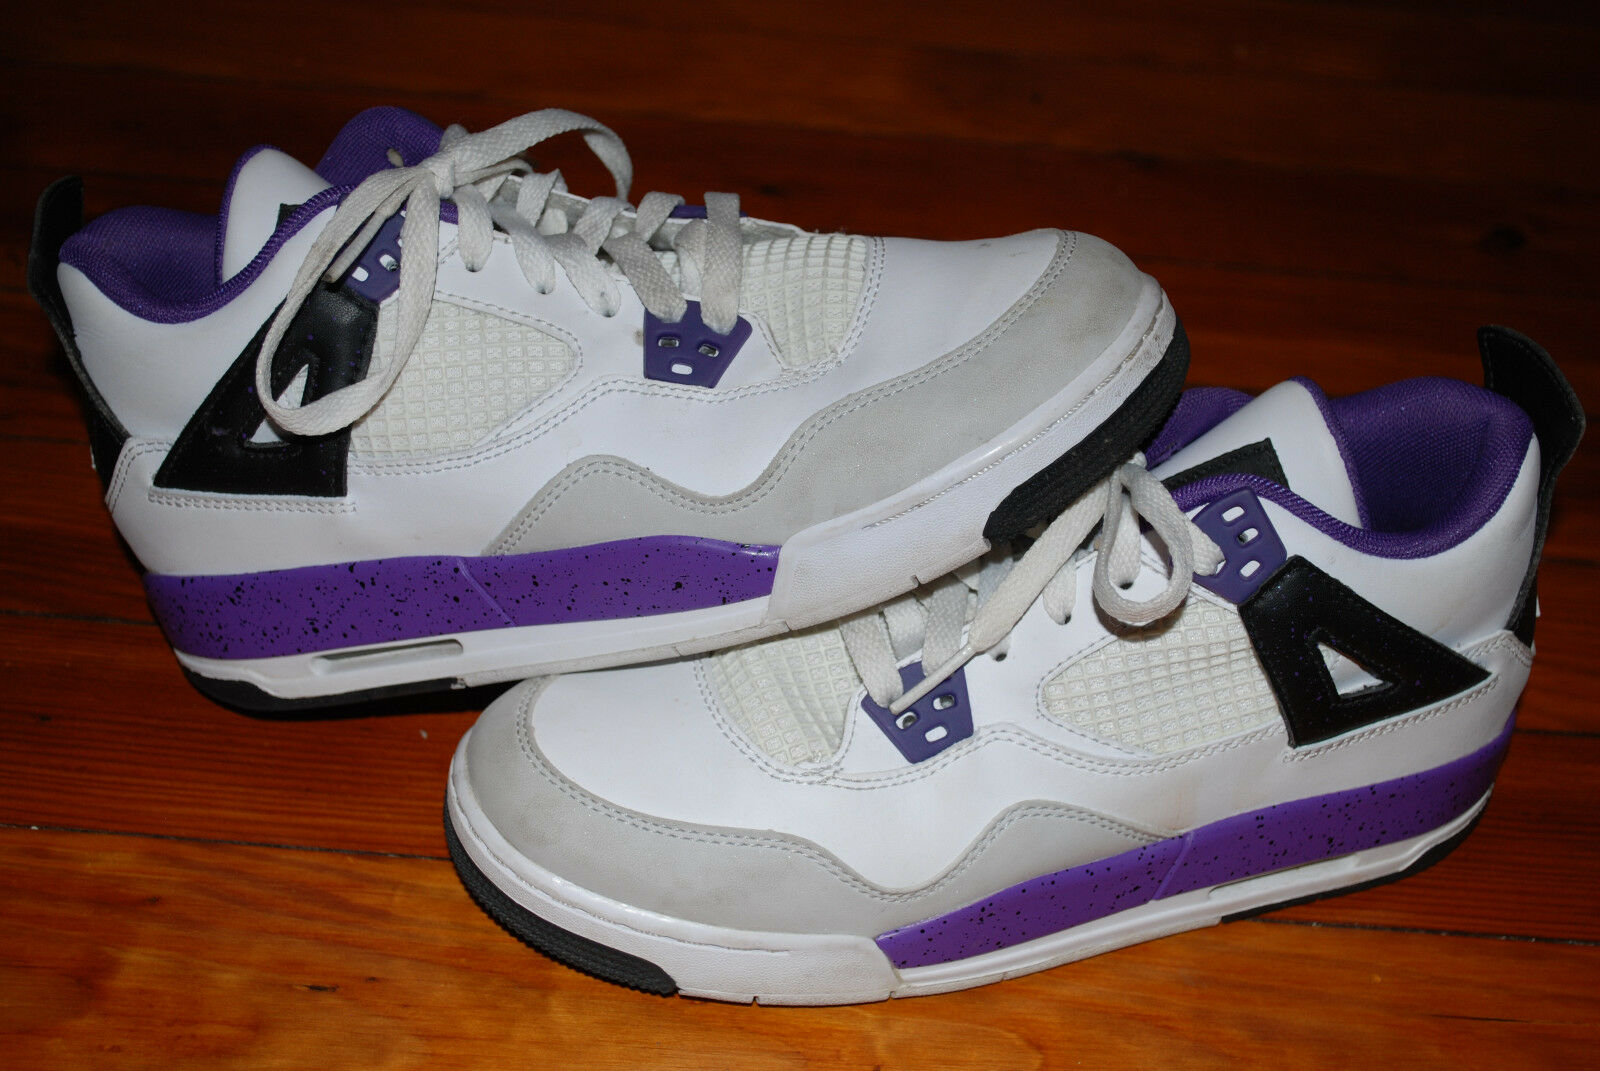 Nike Air Jordan Retro IV 4 GS White Ultra Violet Gray Sneaker Price reduction best-selling model of the brand